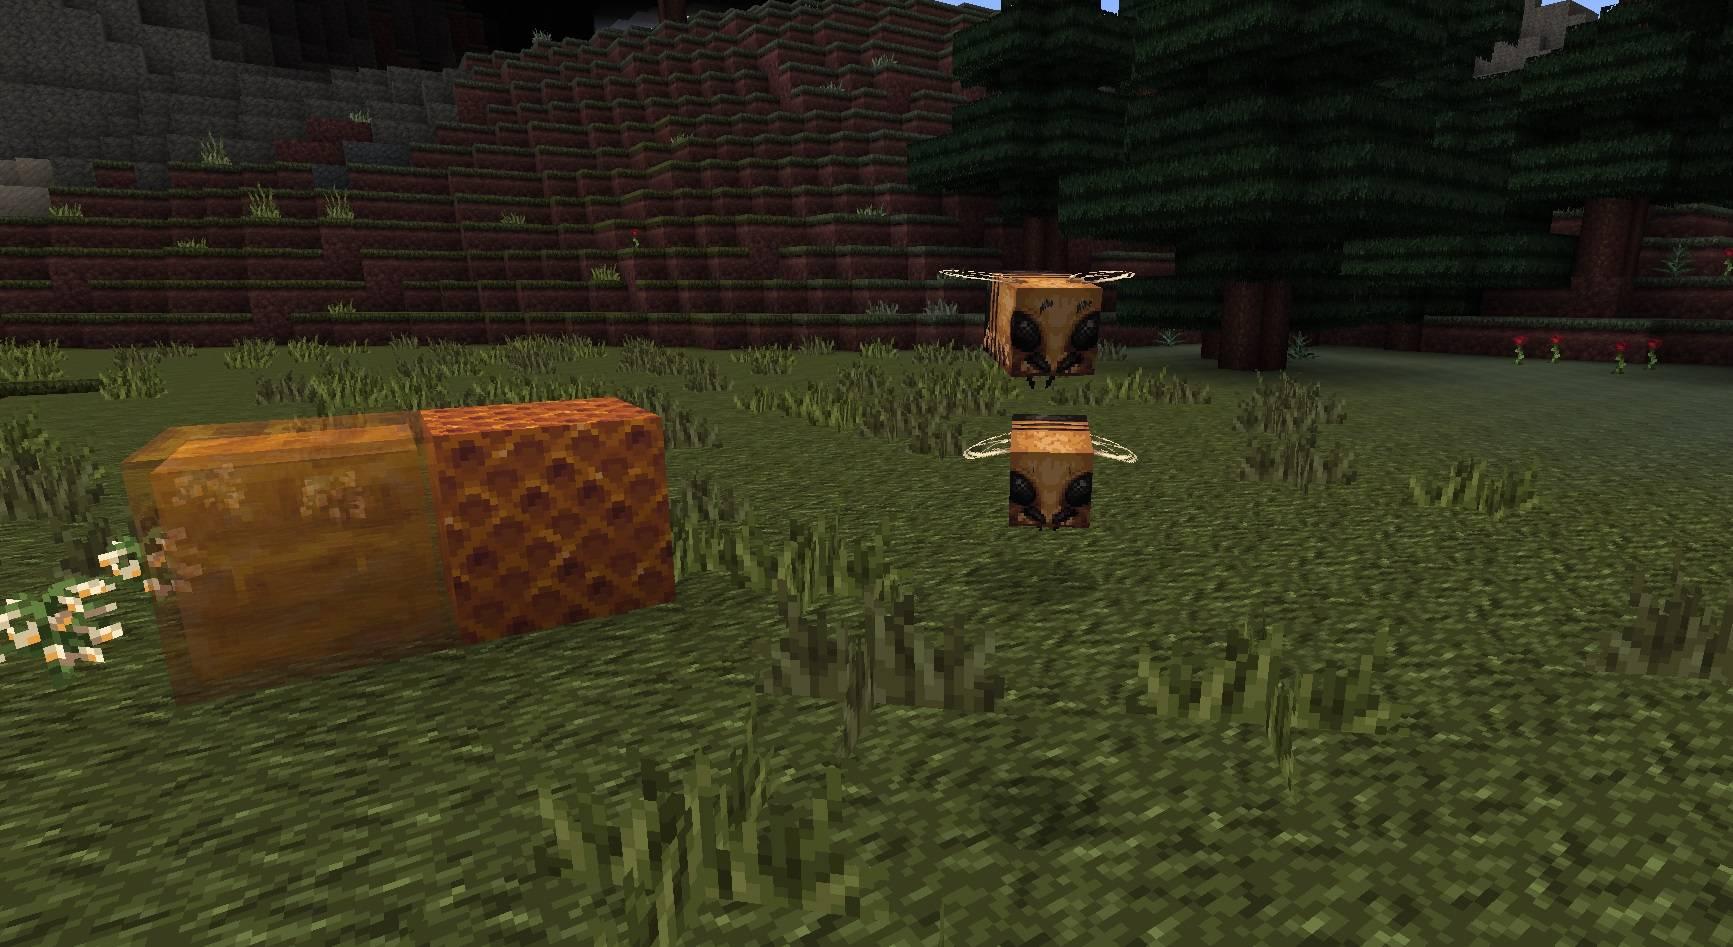 MYTHIC paczka tekstur zasobow 1.15 pszczola blok miodu